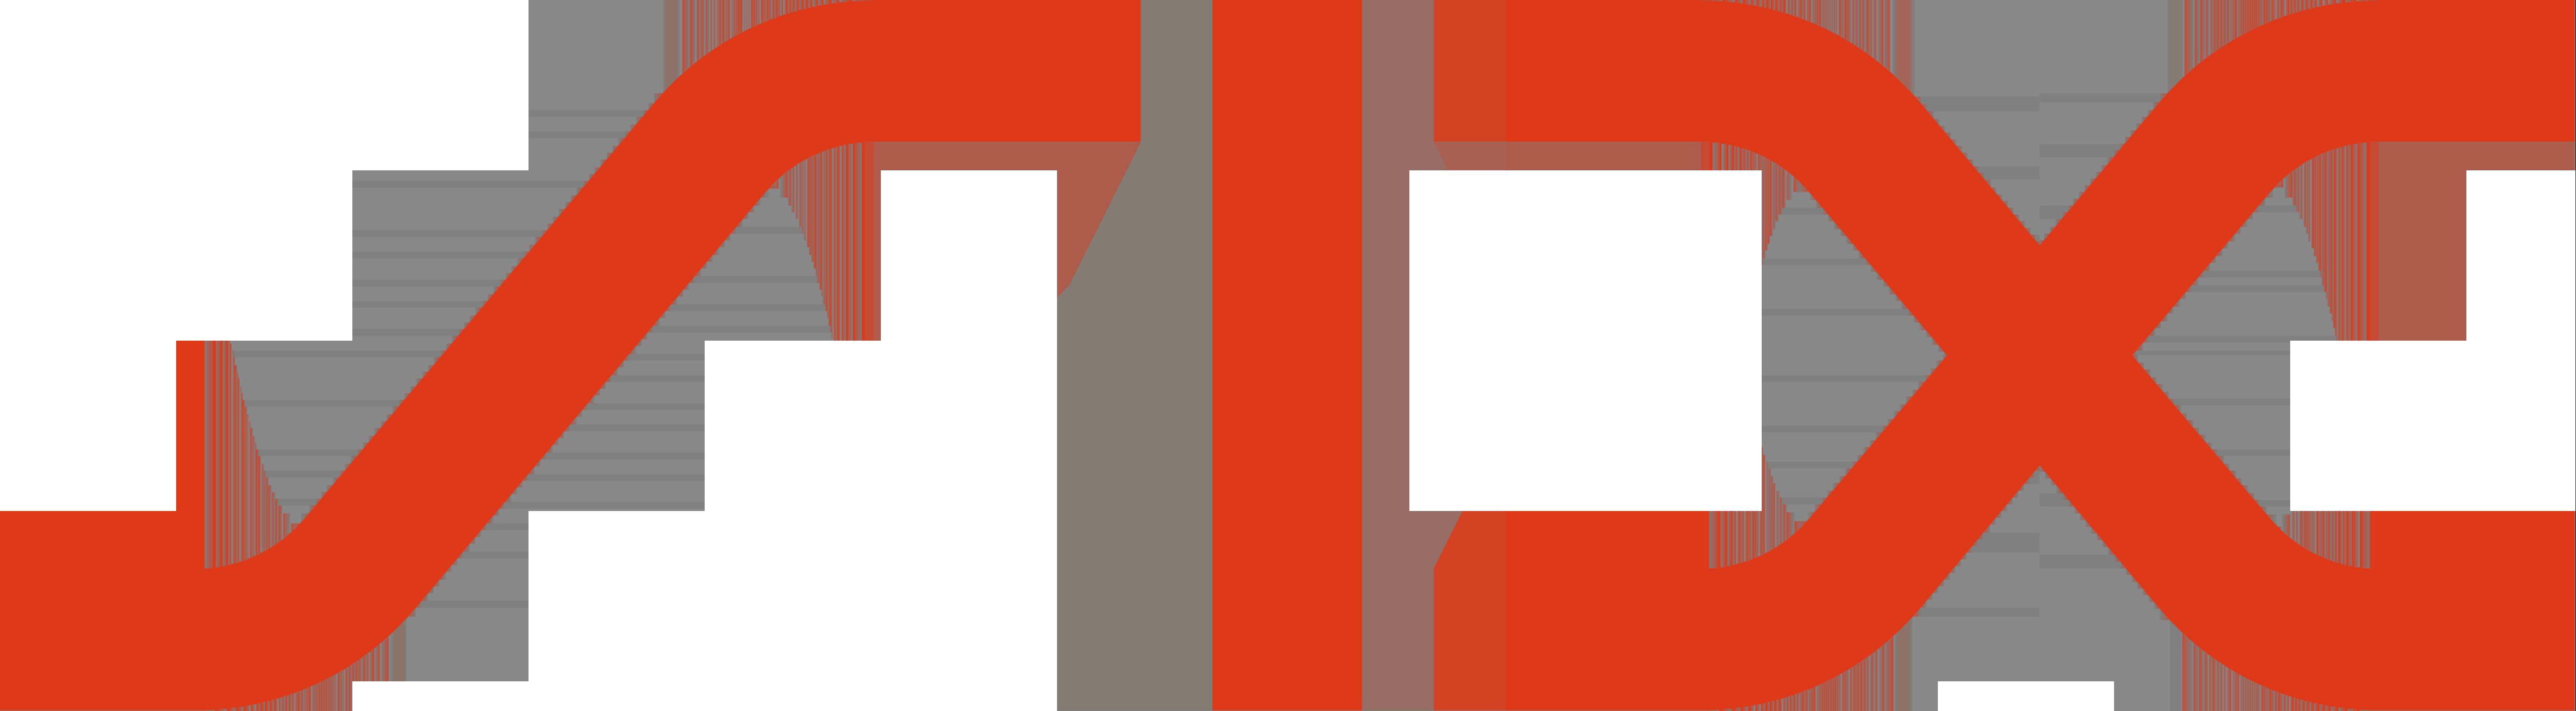 Six Group logo